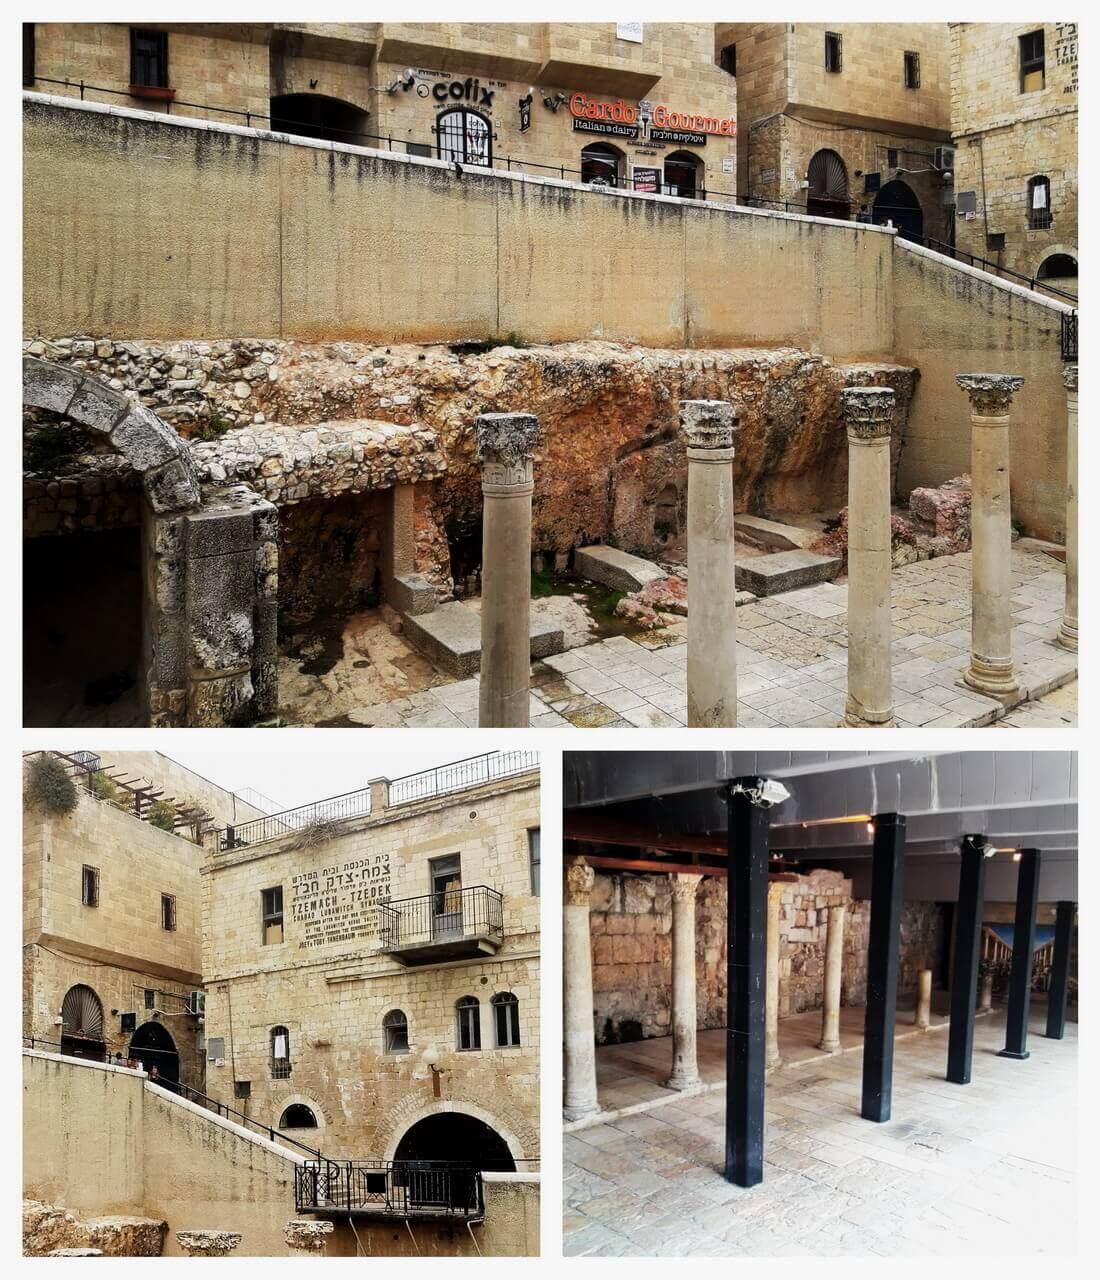 Cardo Maximus, Jerusalem